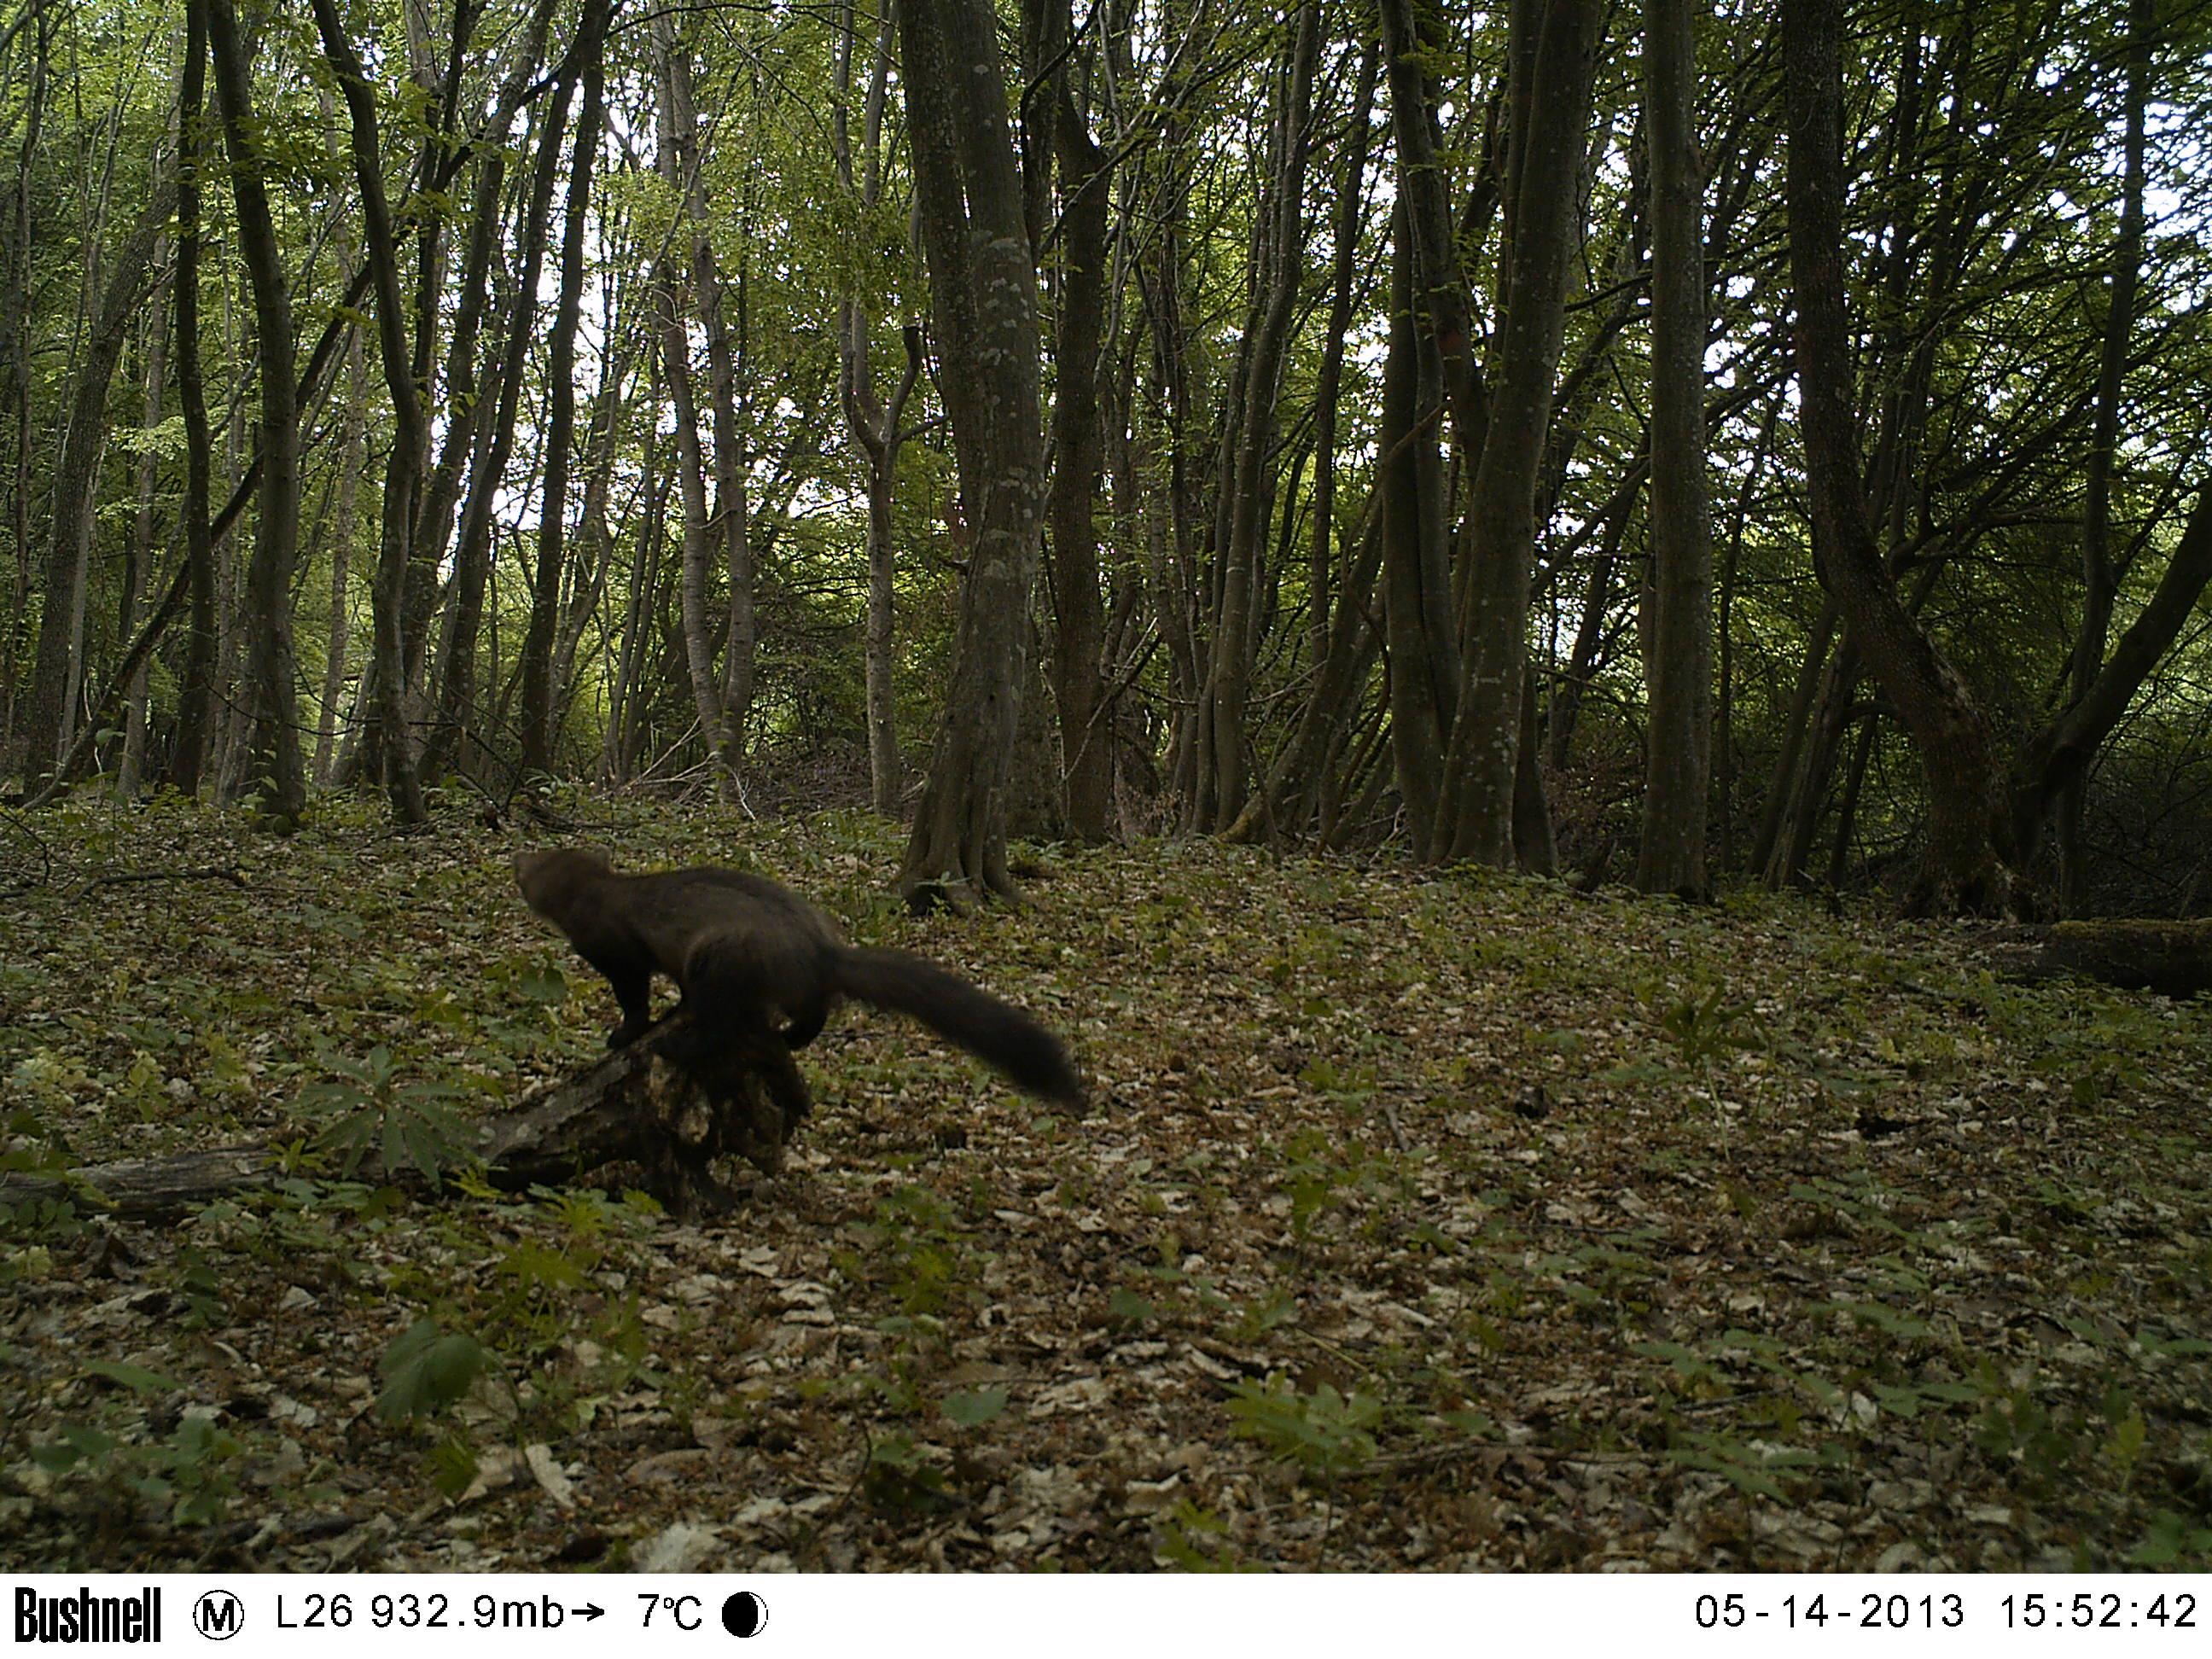 Wildlife conservation case study